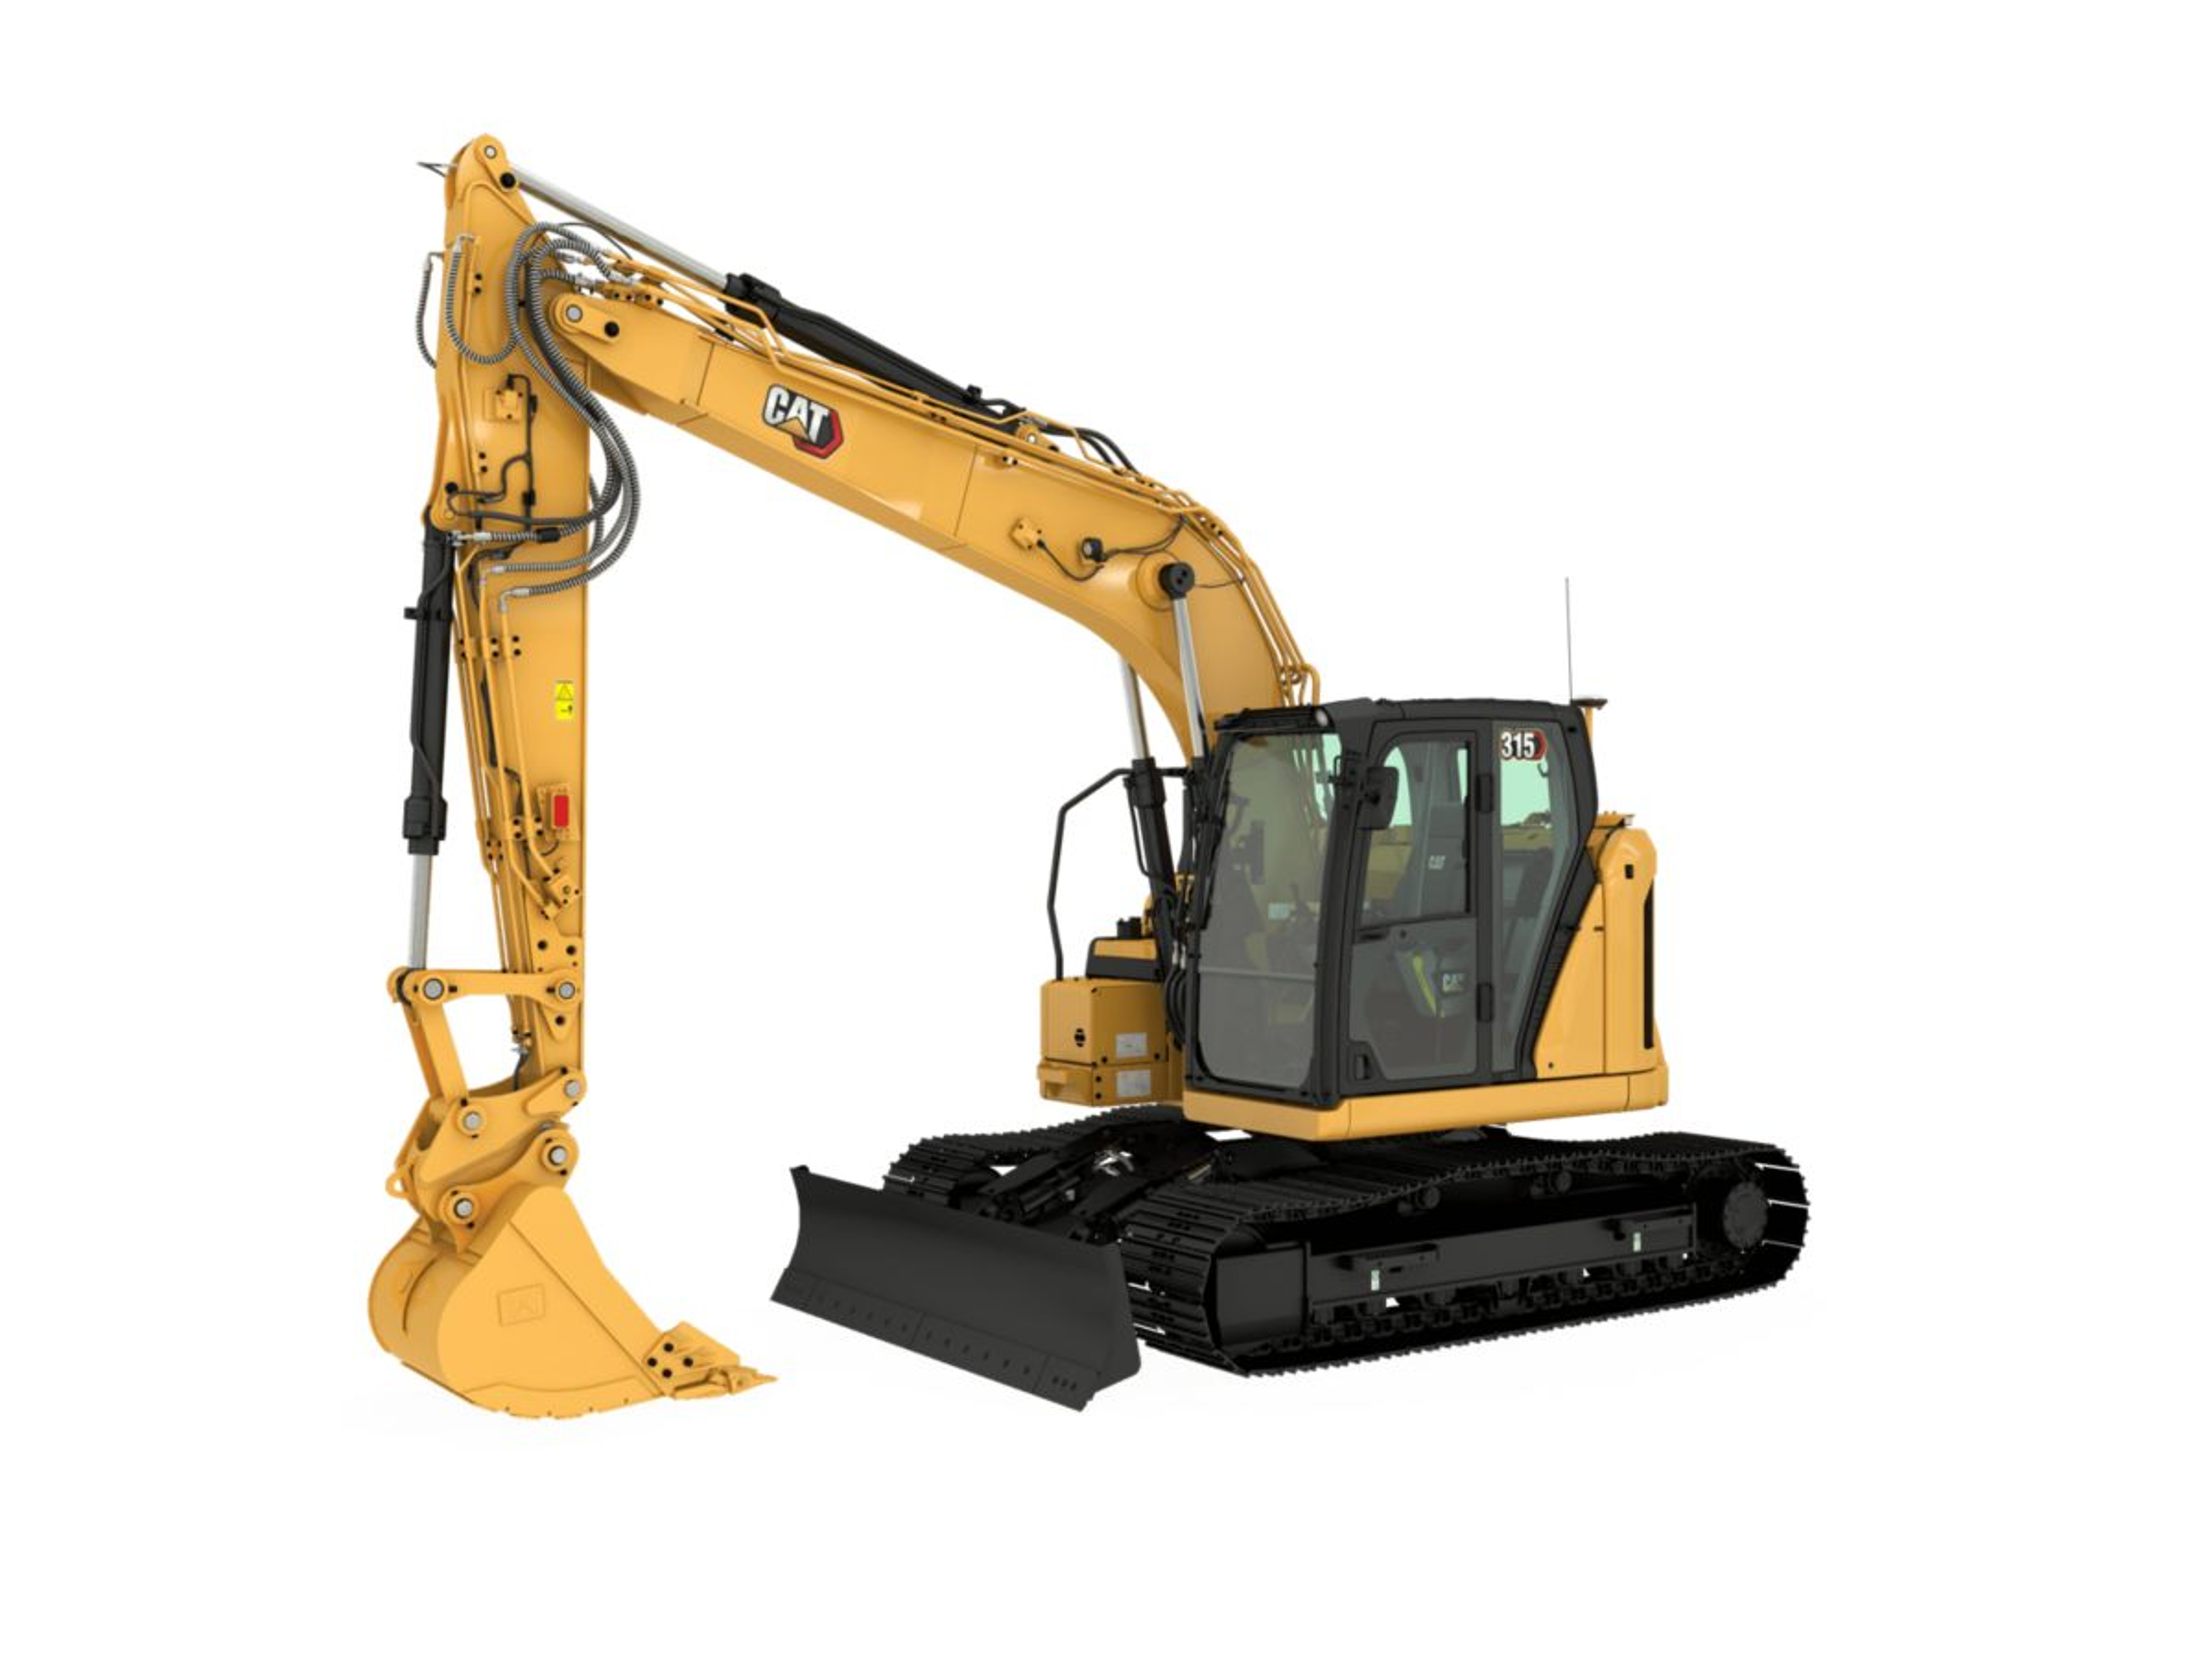 315 Hydraulic Excavator